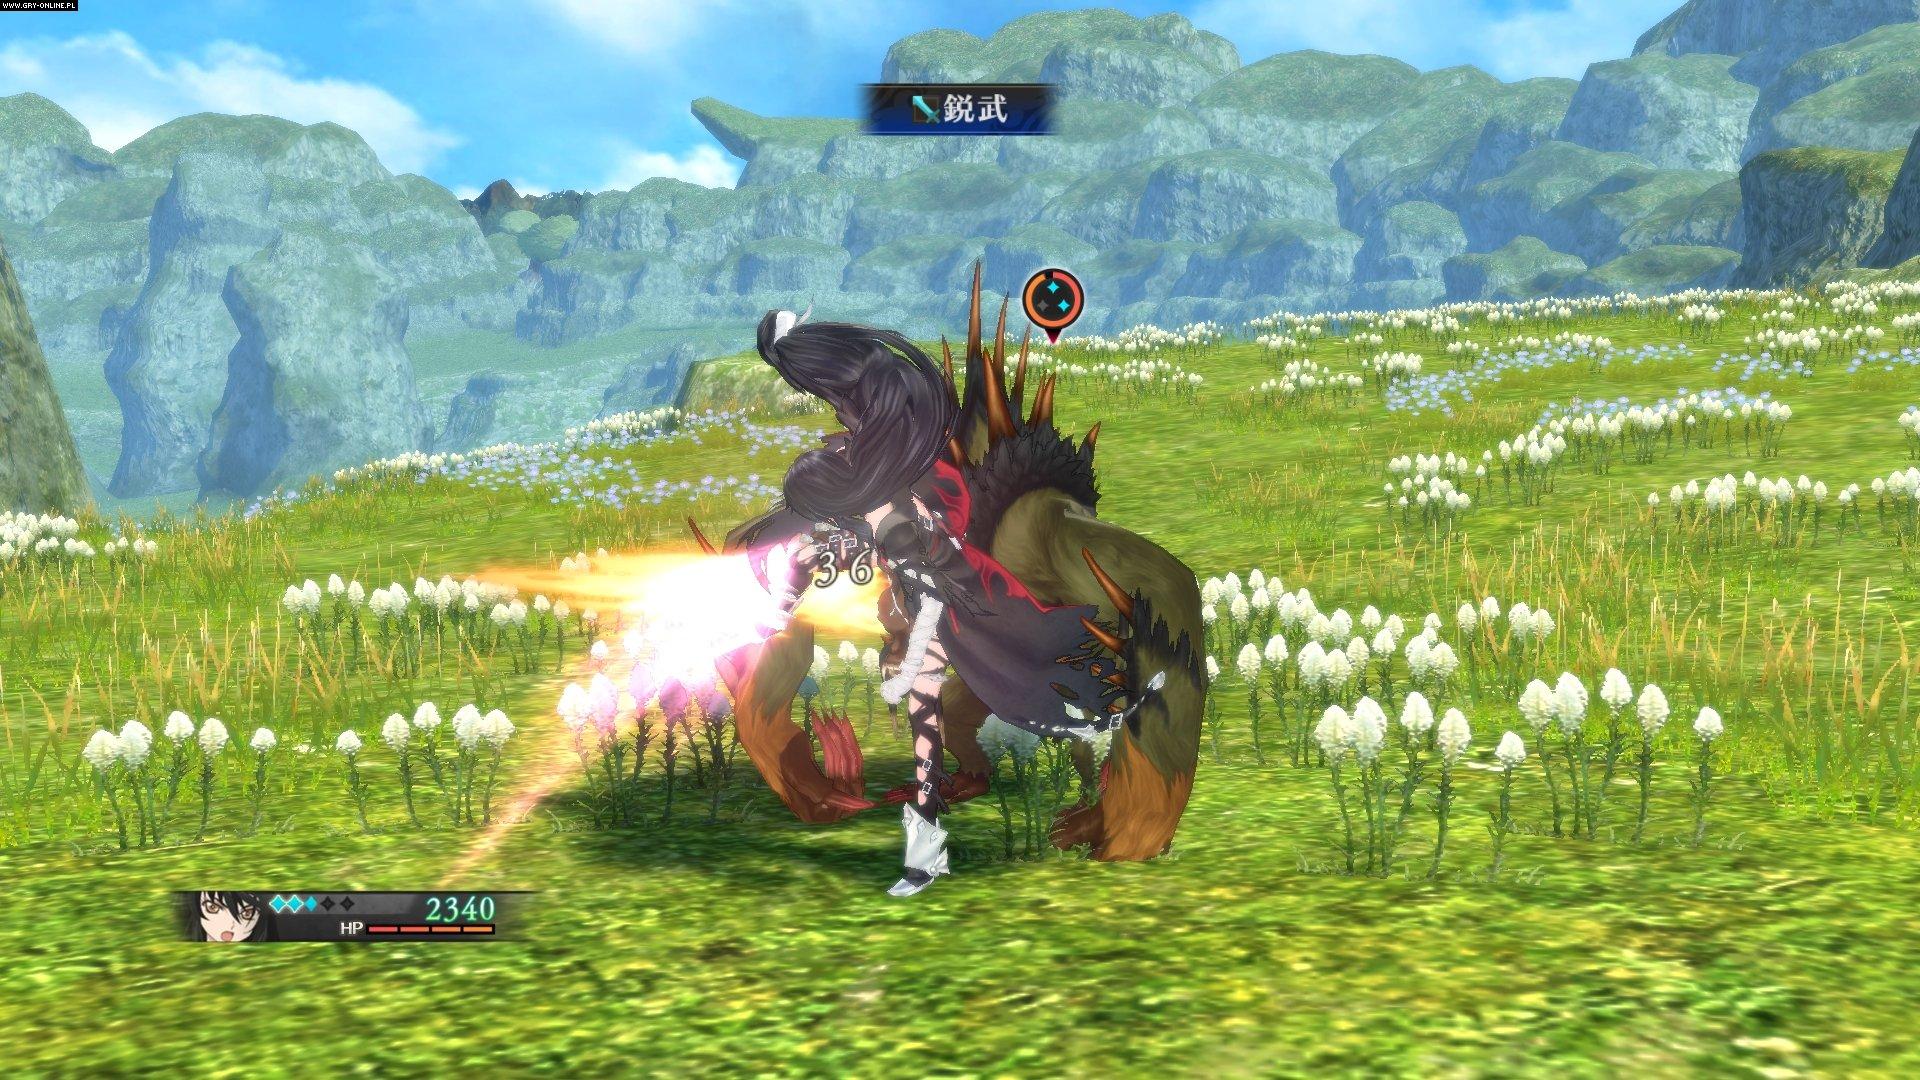 Tales of Berseria PS4, PS3, PC Games Image 143/143, Bandai Namco Entertainment